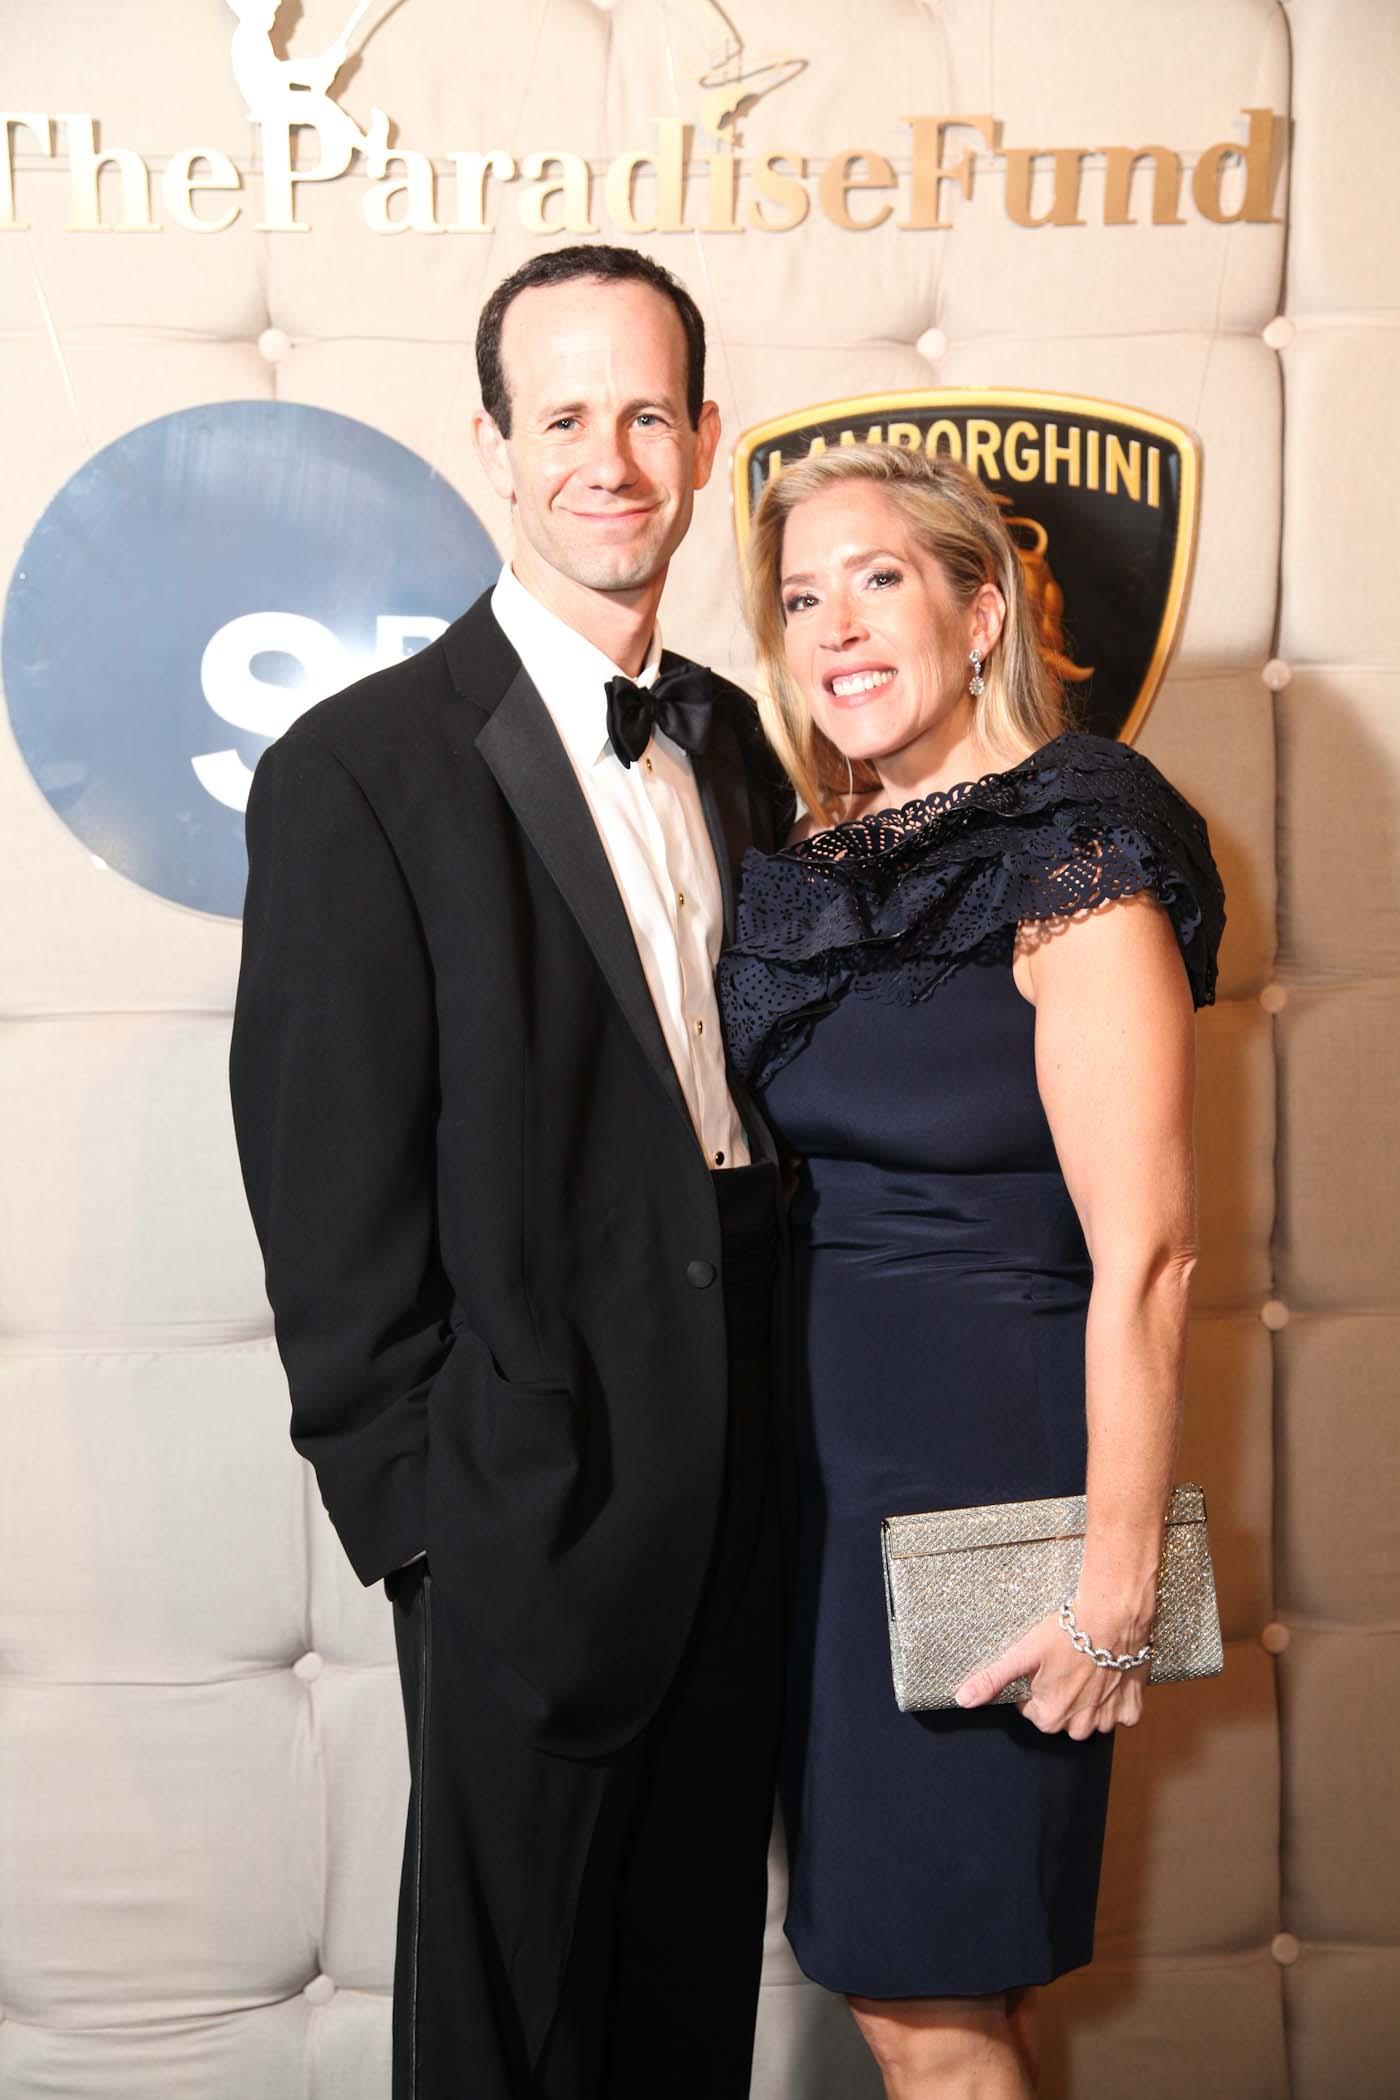 Ben and Elizabeth Gordon